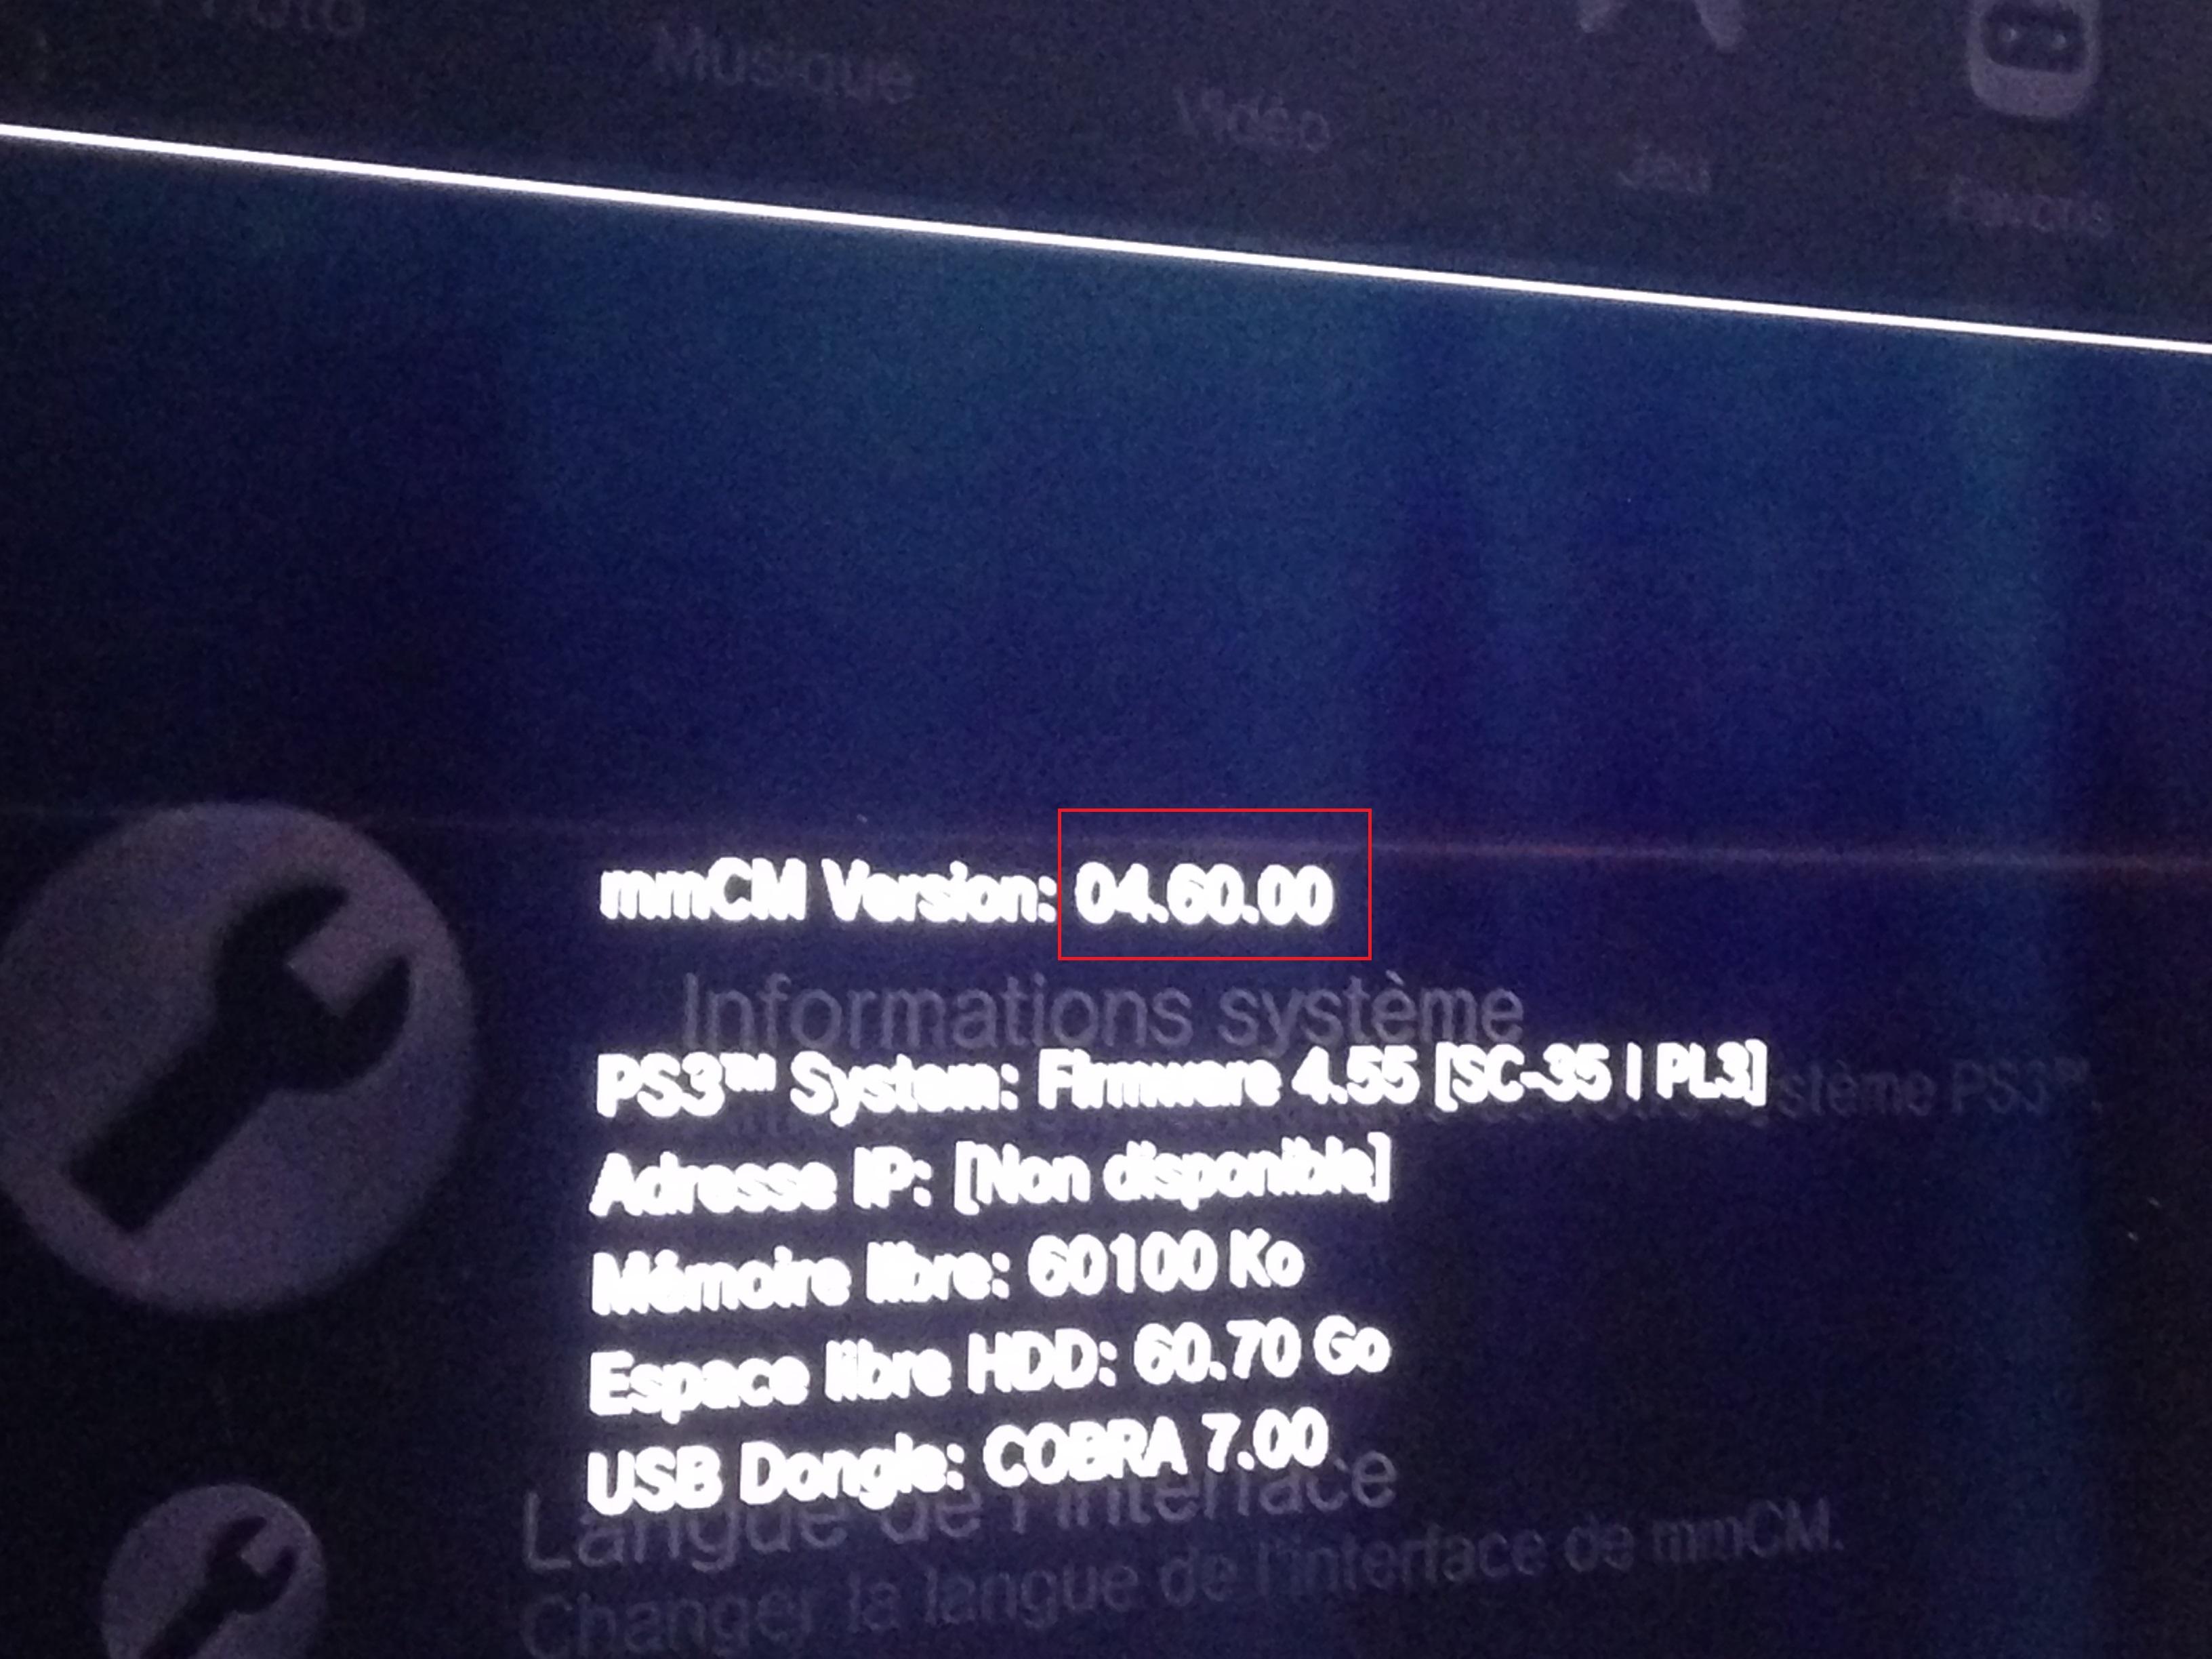 comment installer cfw habib 4.60